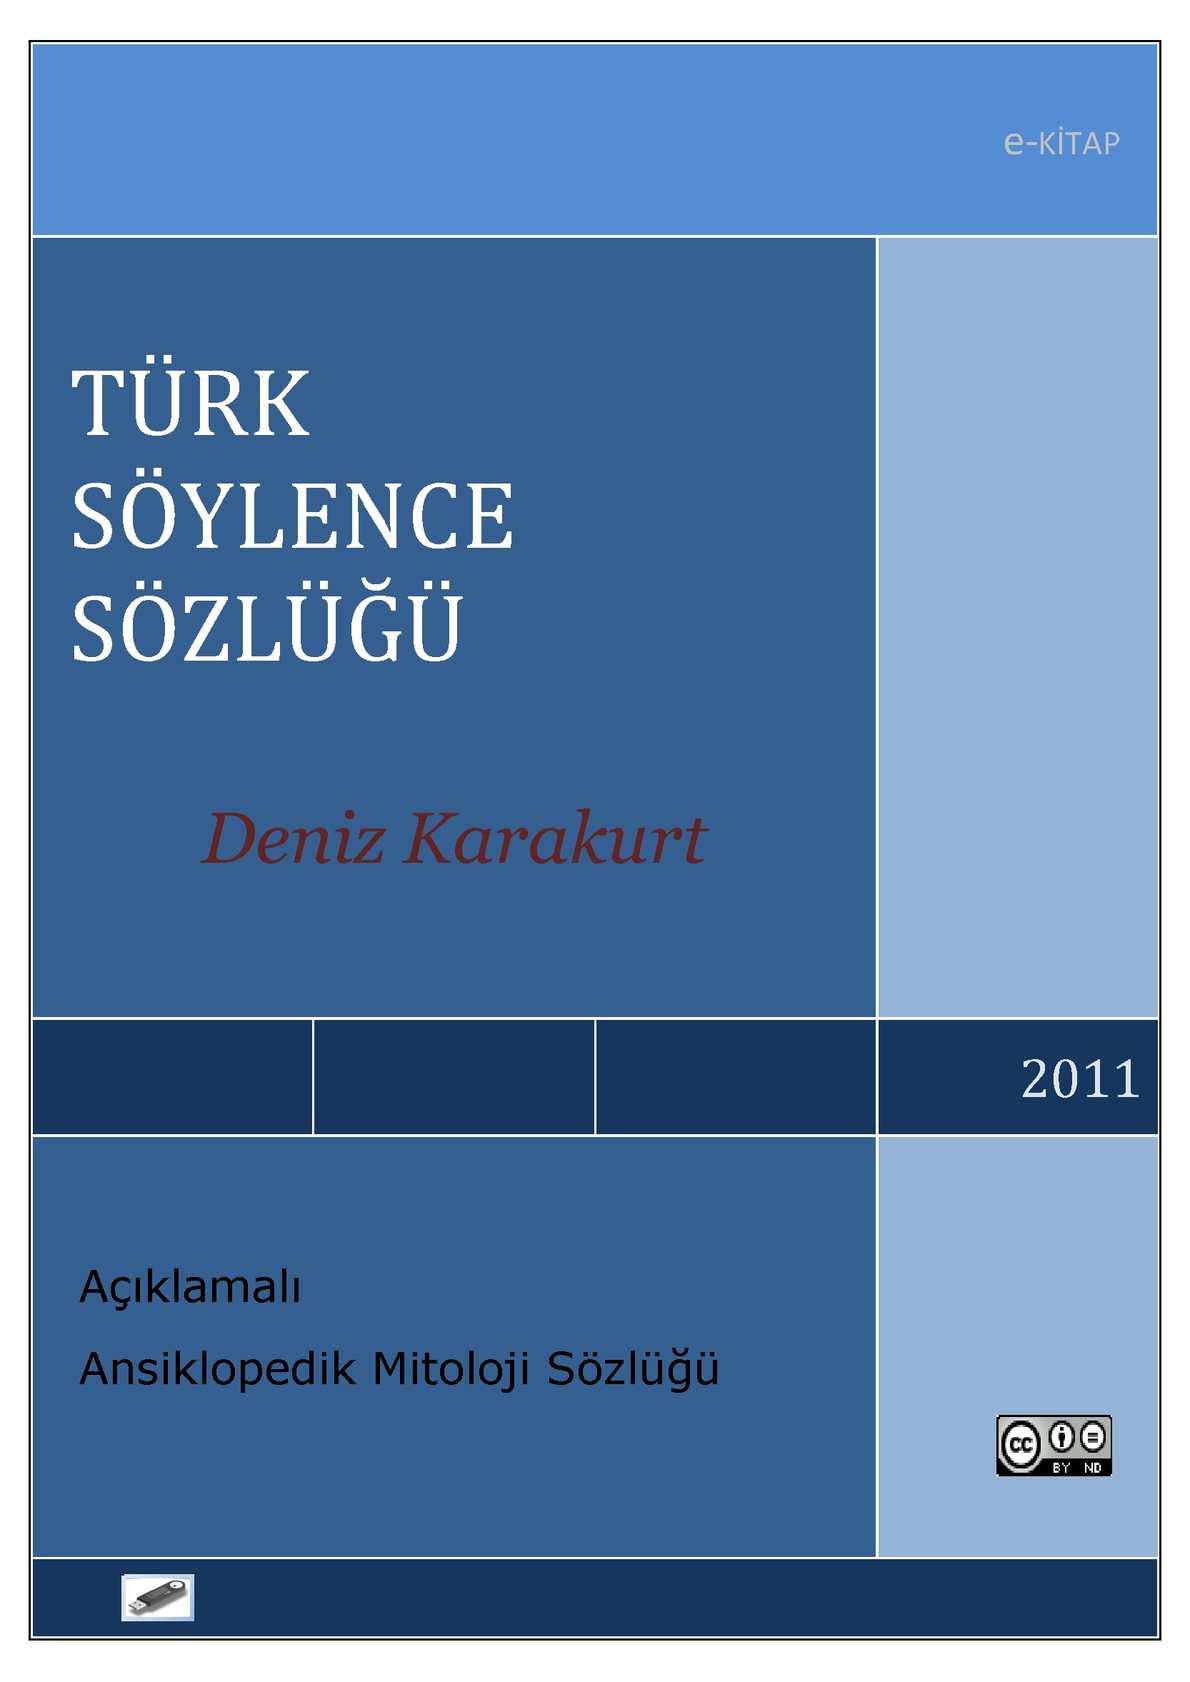 Calaméo Turk Soylence Sozlugu